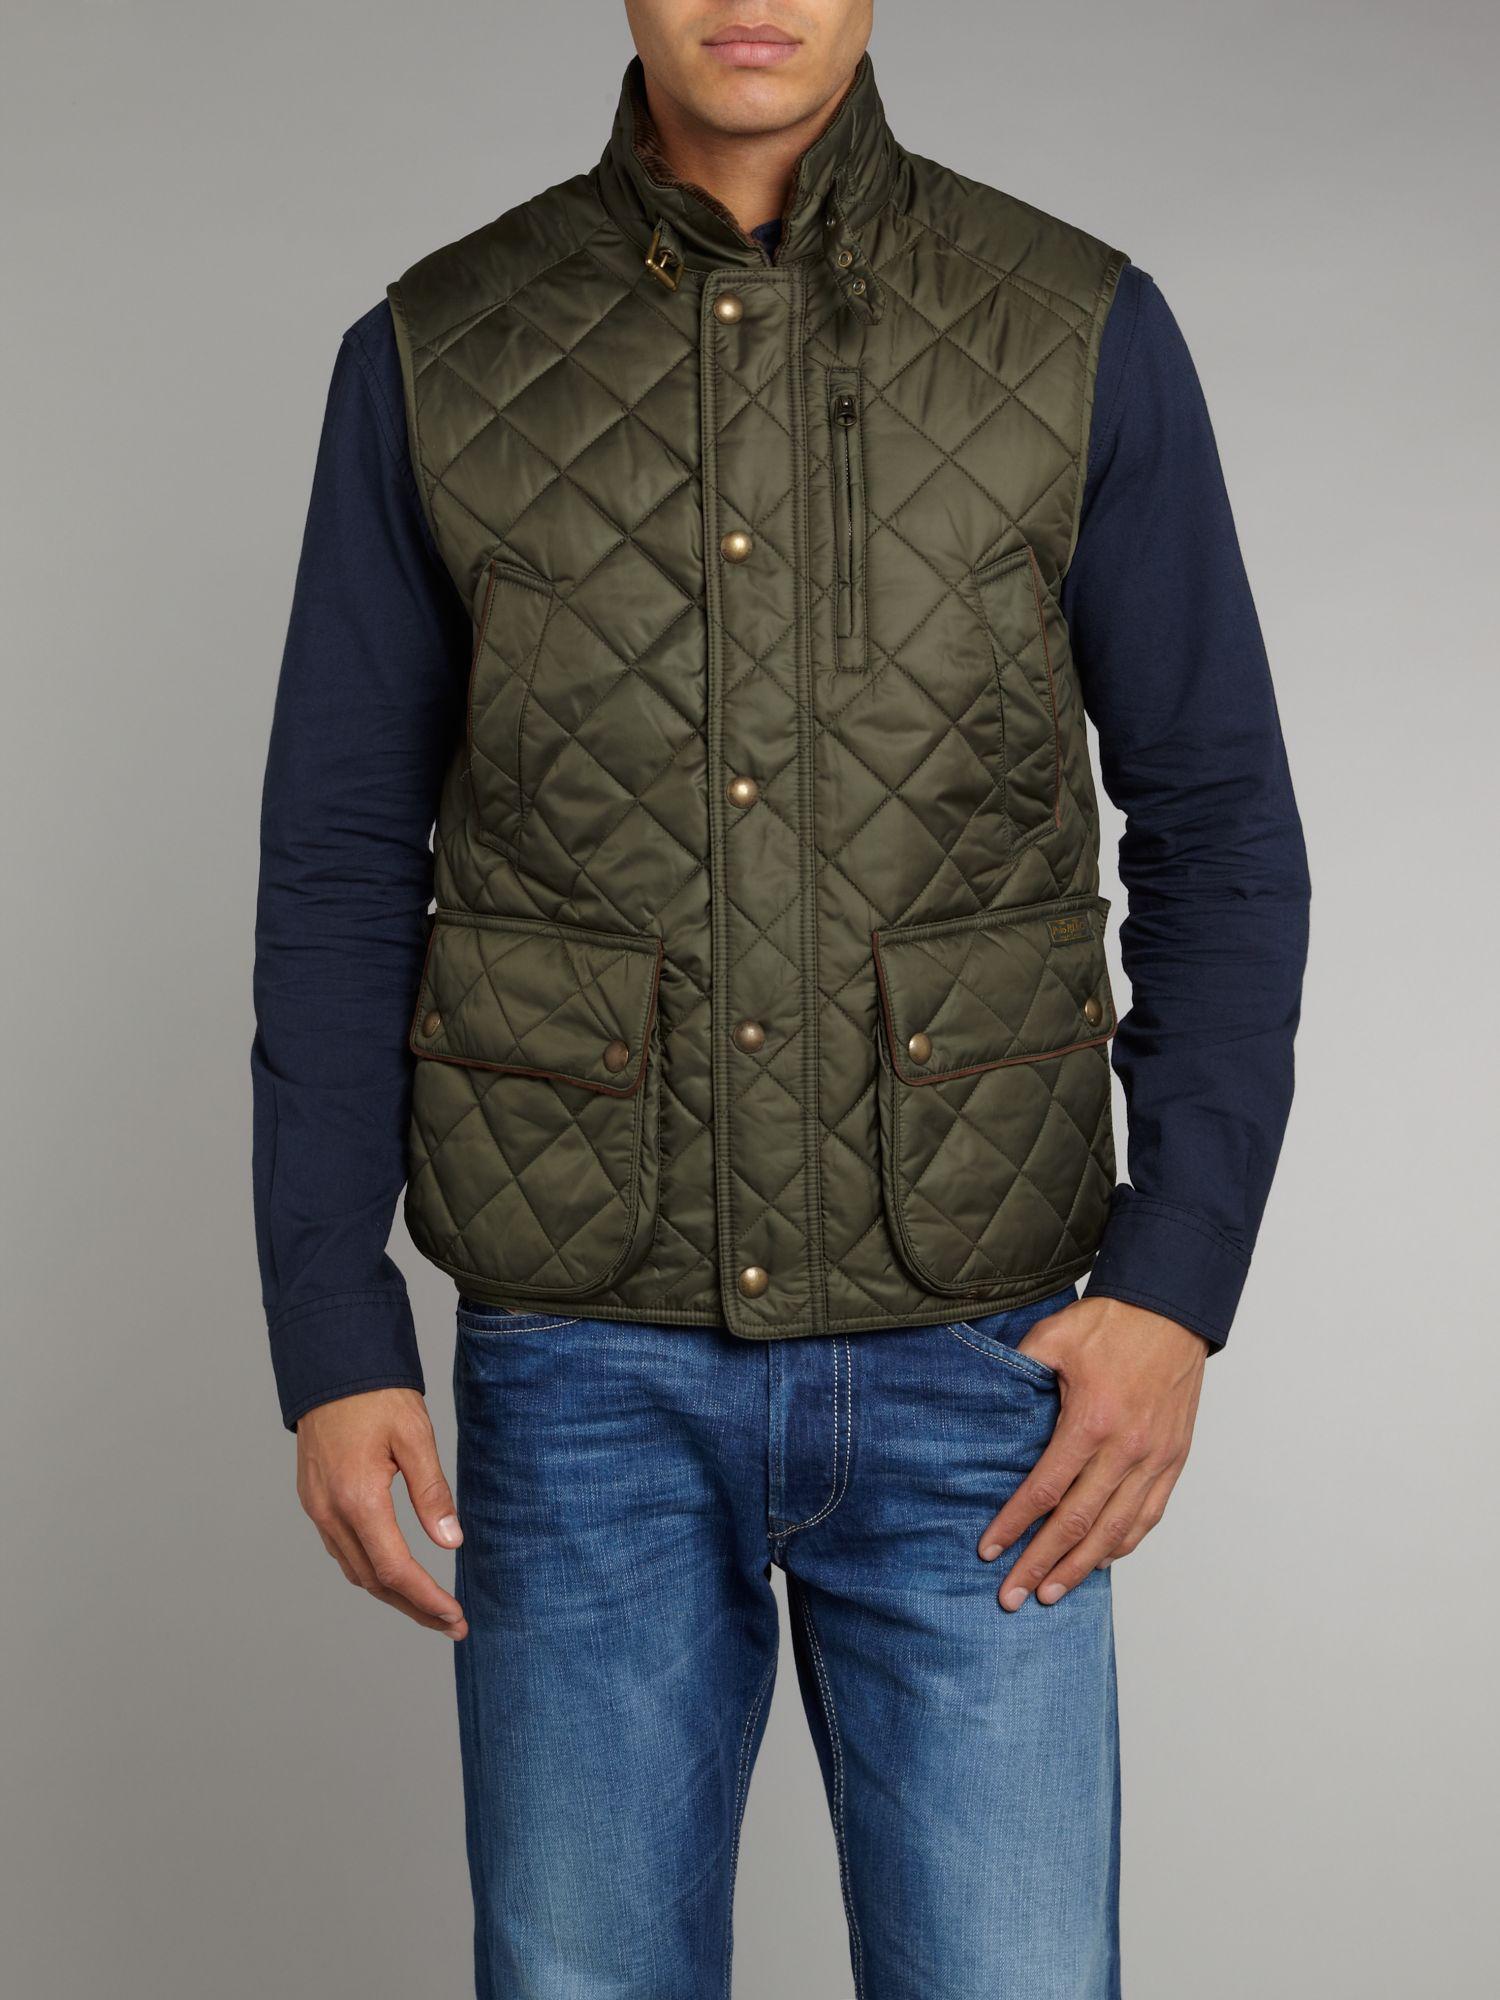 Polo Ralph Lauren Quilted Vest In Green For Men Lyst